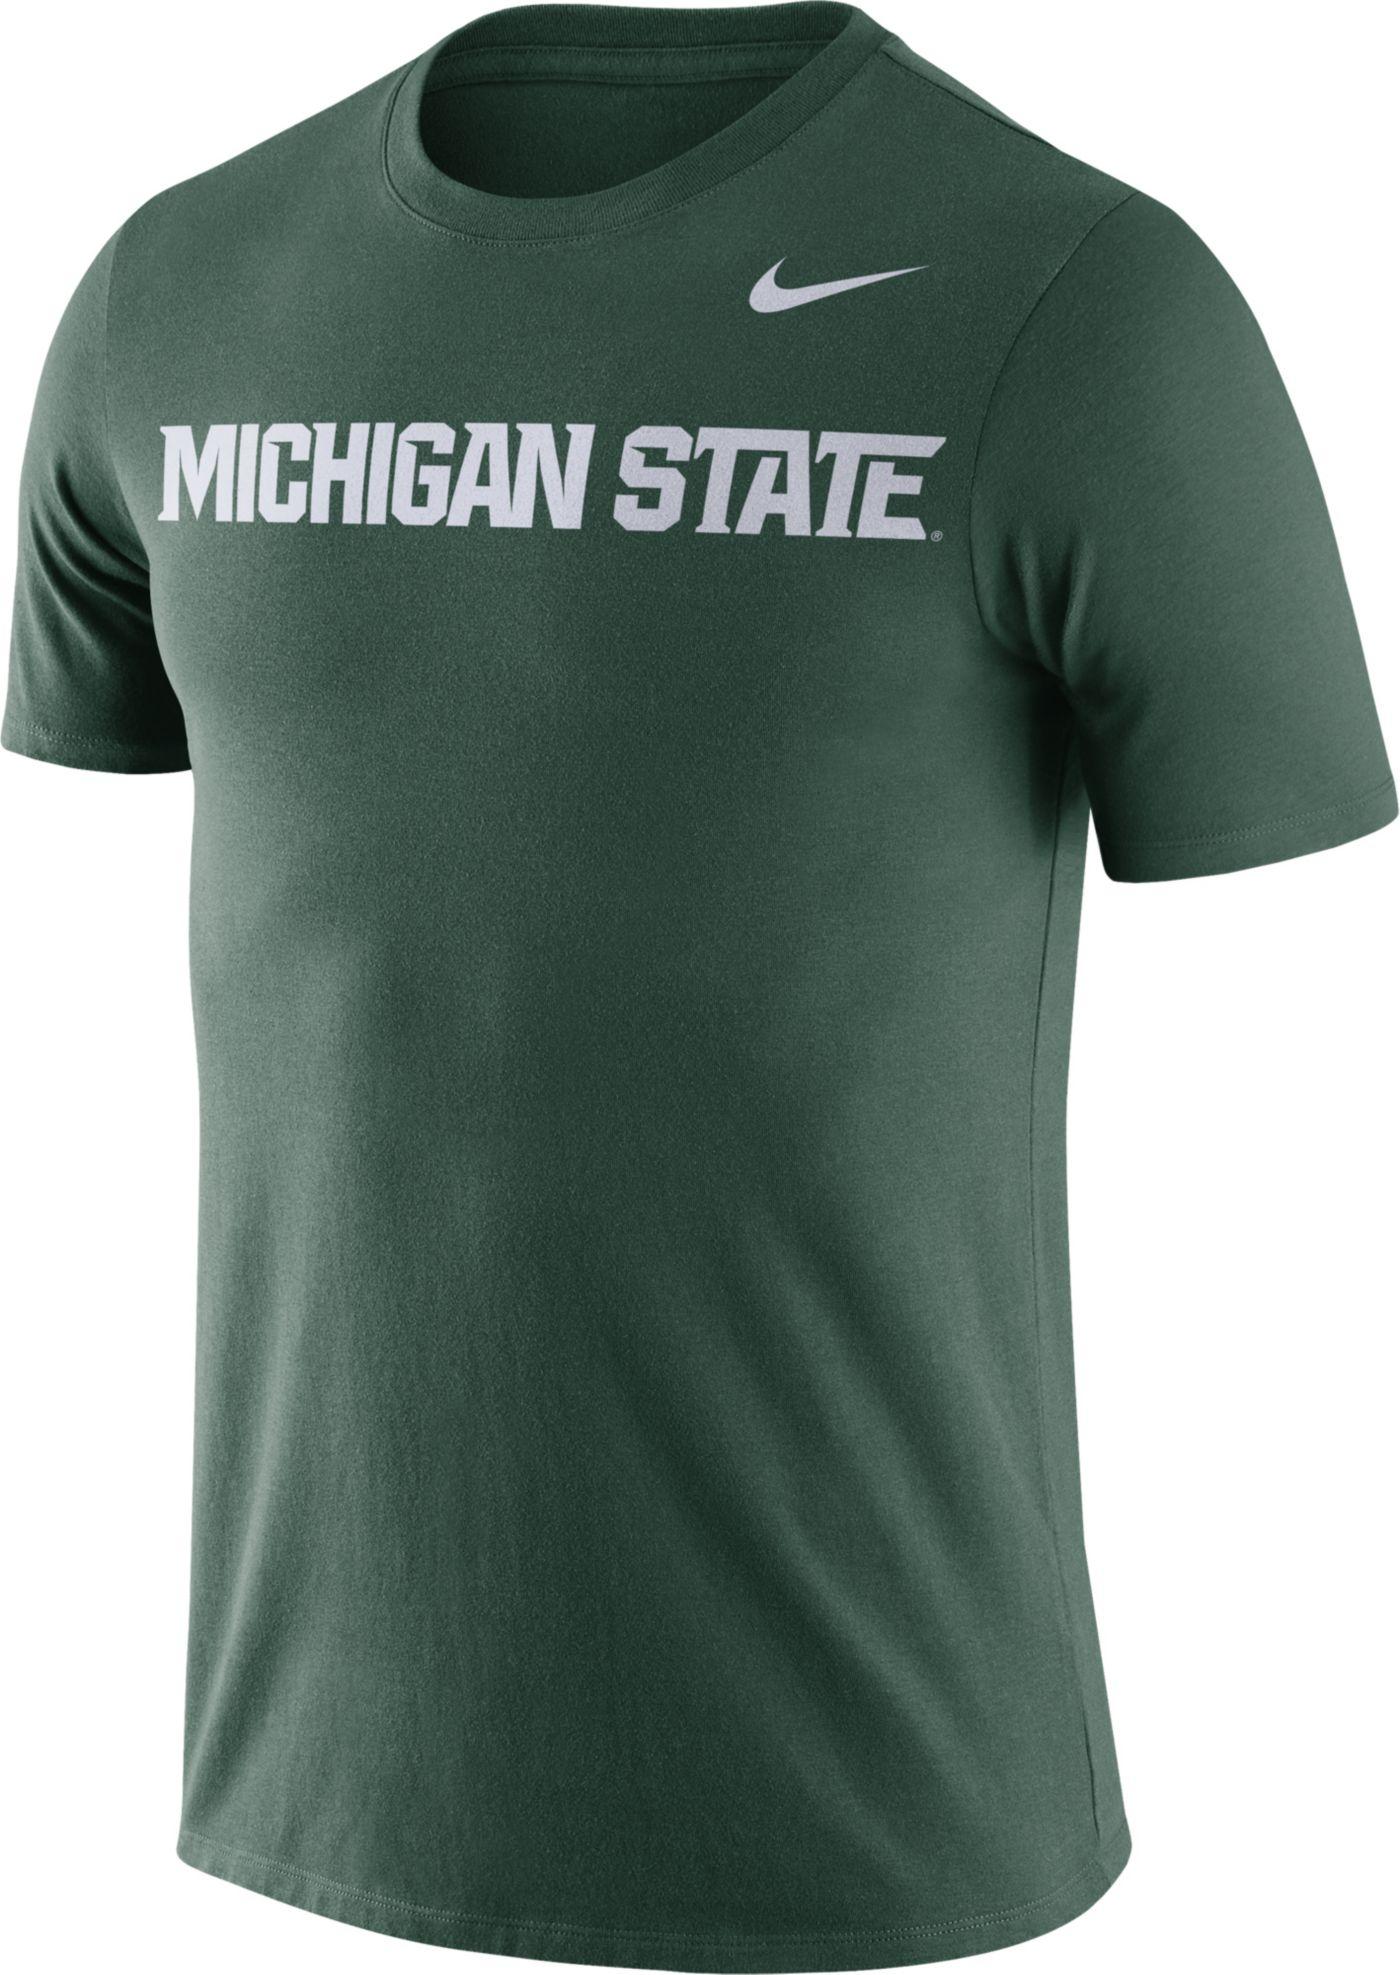 Nike Men's Michigan State Spartans Green Dri-FIT Cotton Word T-Shirt